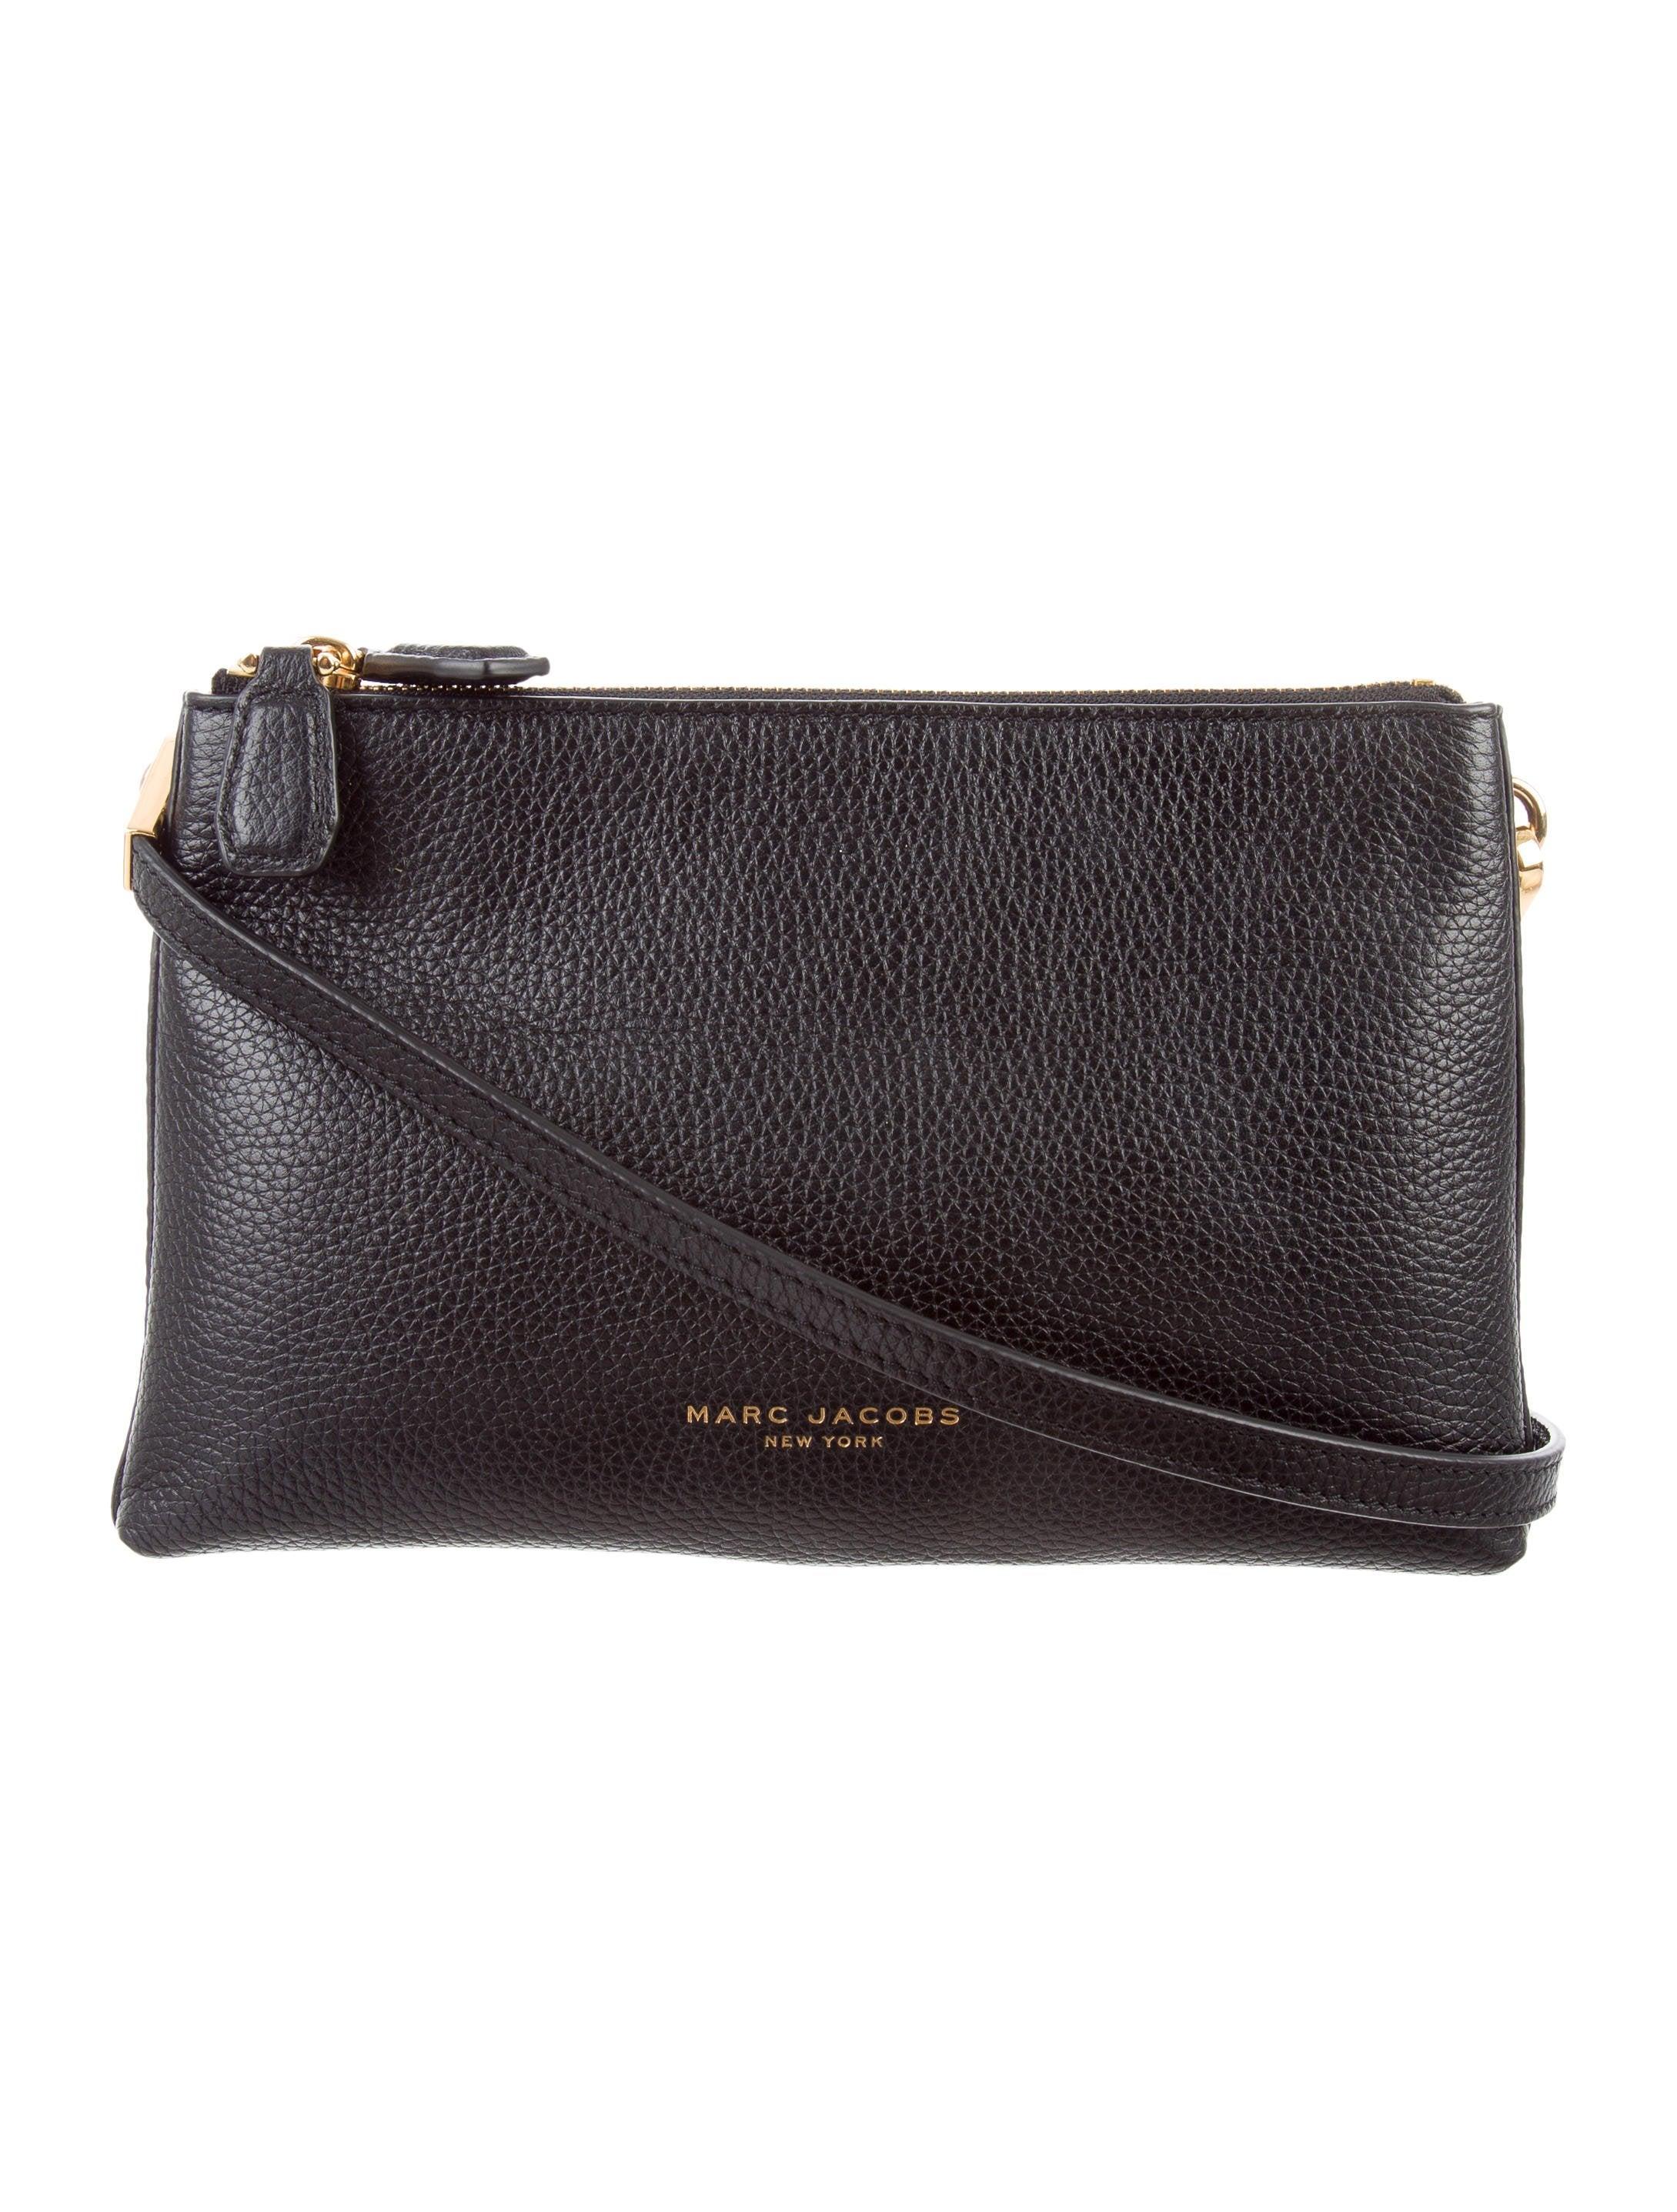 bdb579fc720 Marc Jacobs Pike Place Double Percy Crossbody Bag - Handbags - MAR50800 |  The RealReal